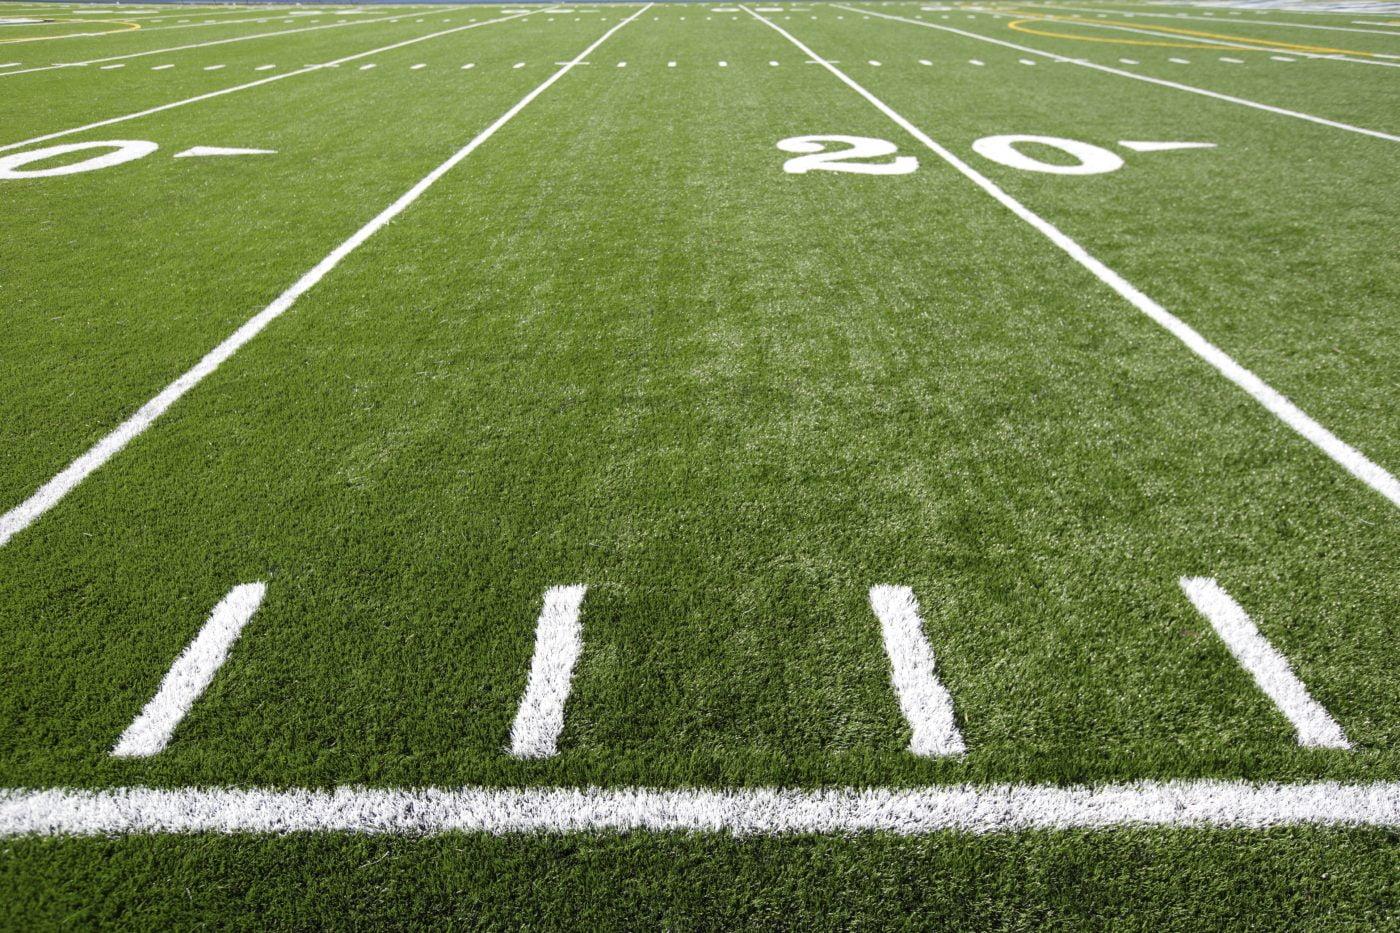 Synthetic Turf Football Field | Why Choose Turf | SporTurf